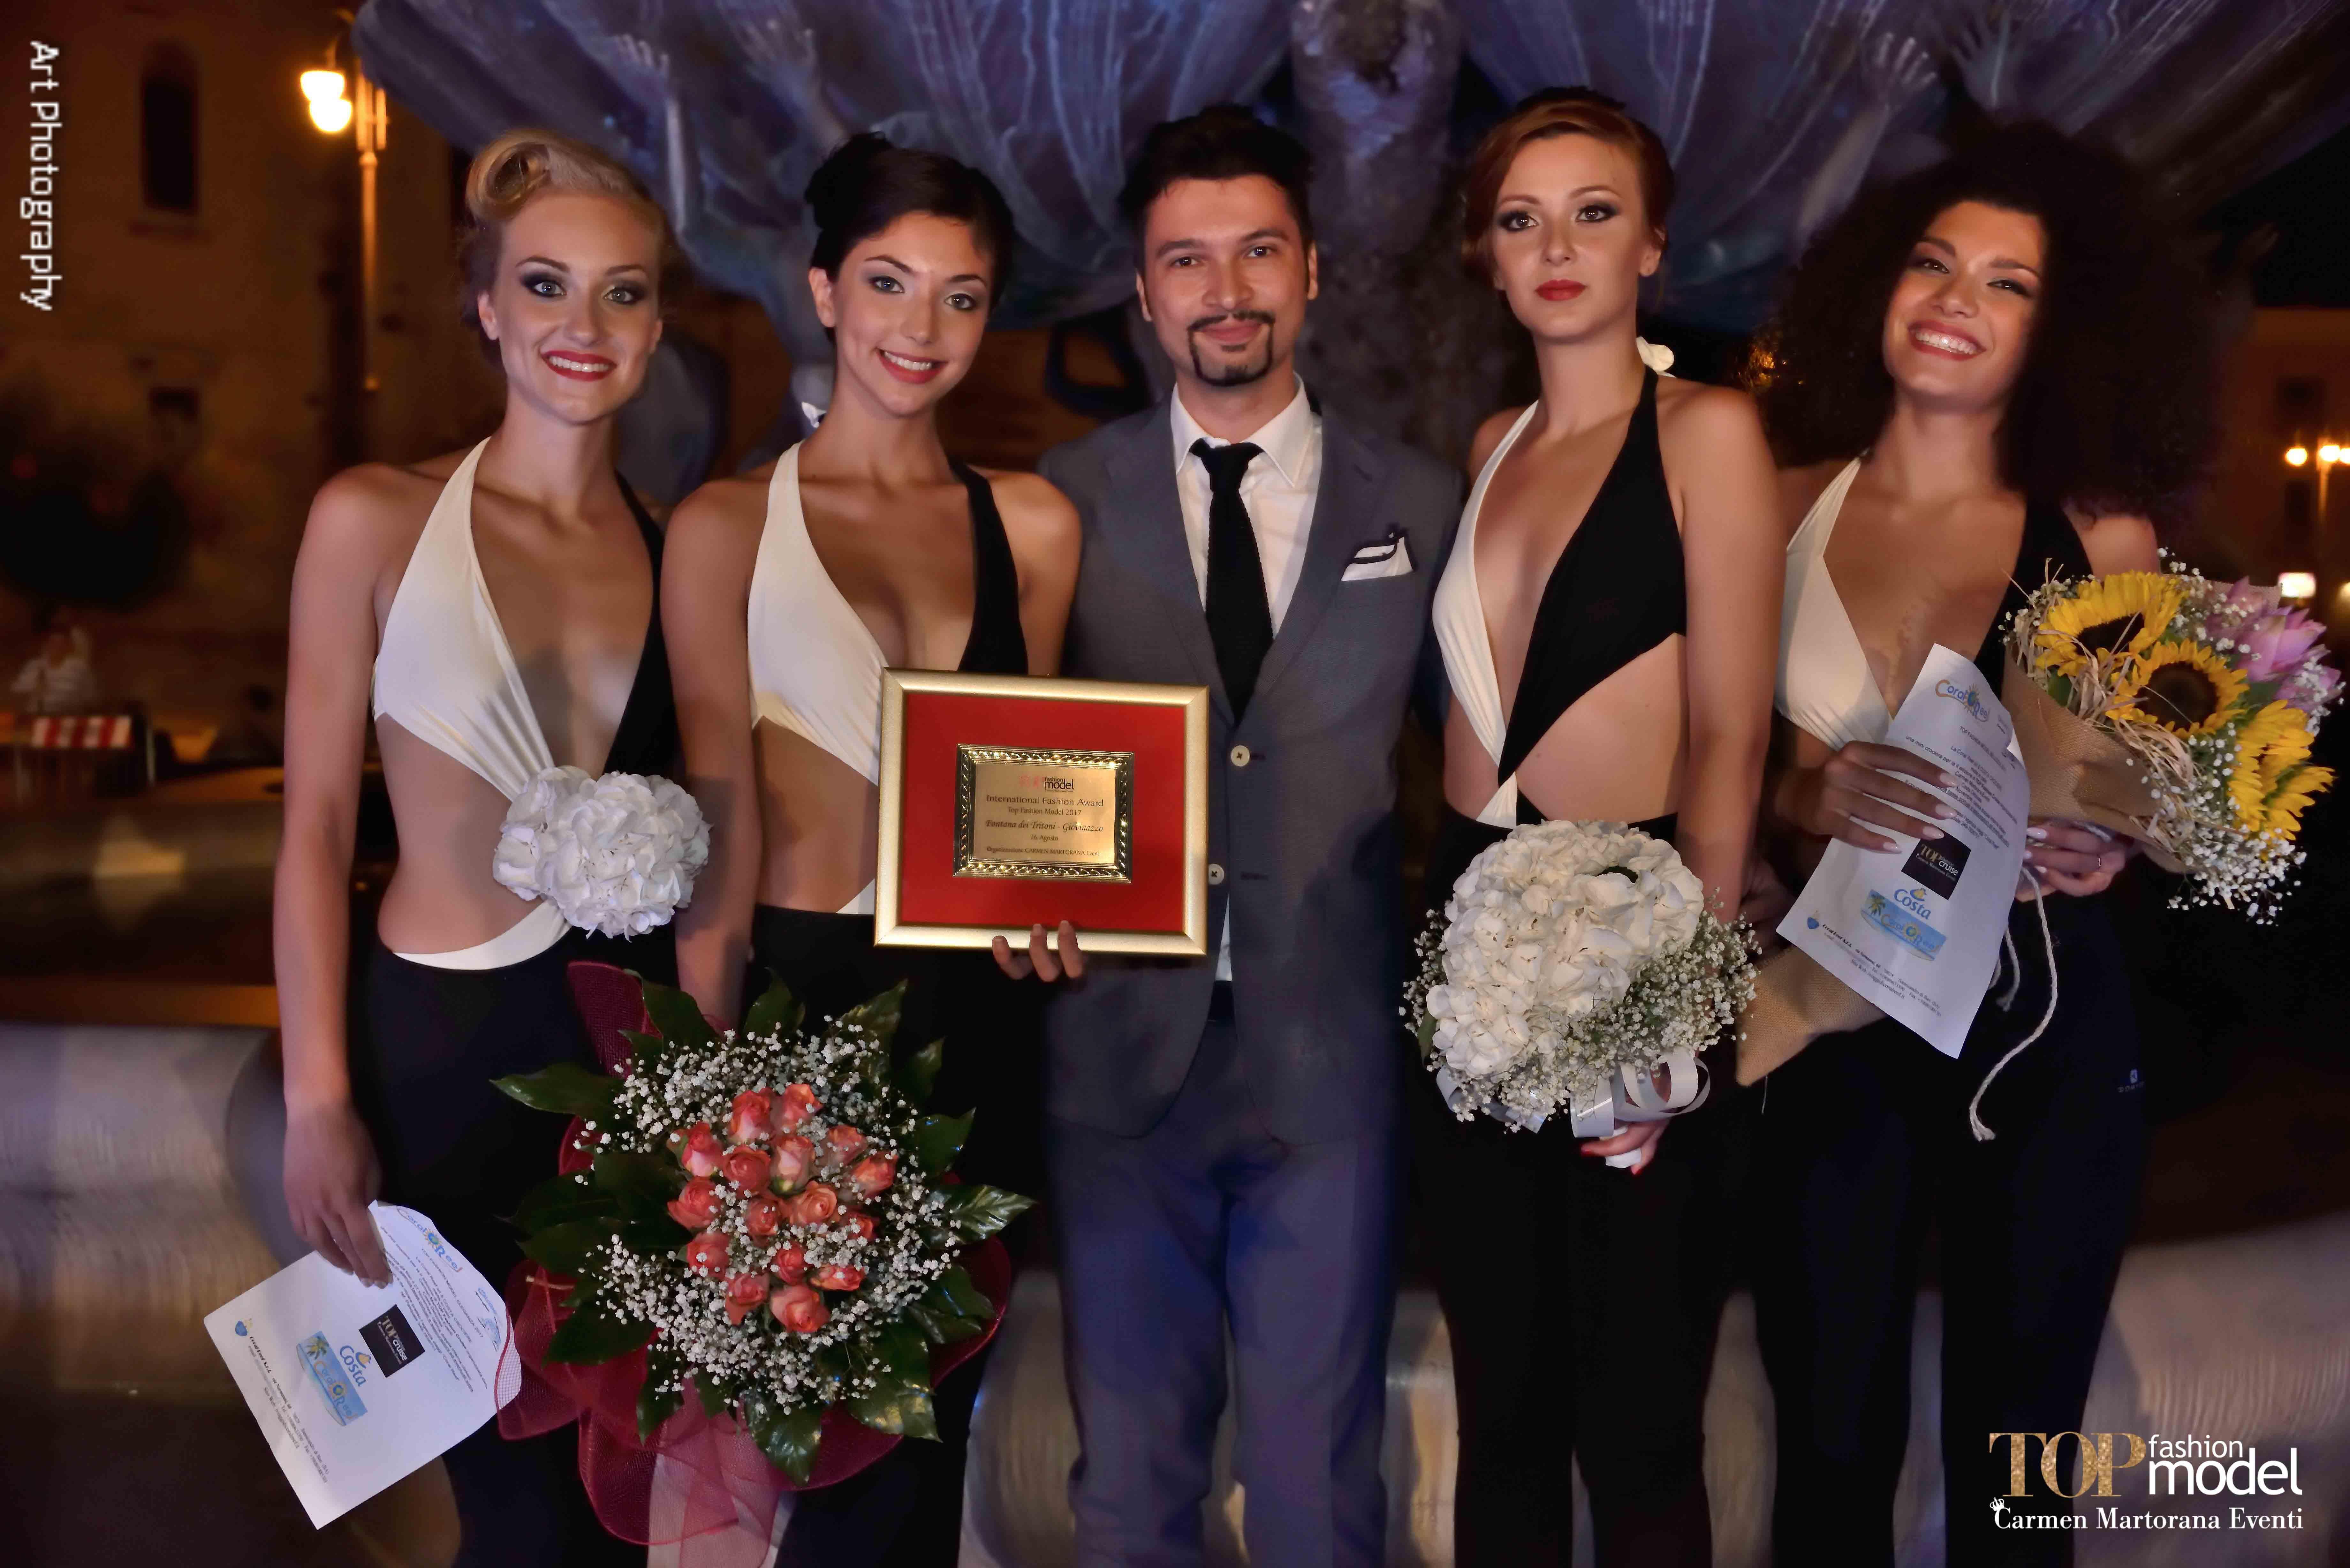 Gioele de Liso, Roberta Molinini, Giorgia Di Lernia, Gemma Di Vittorio, Francesca Pia Raffaele